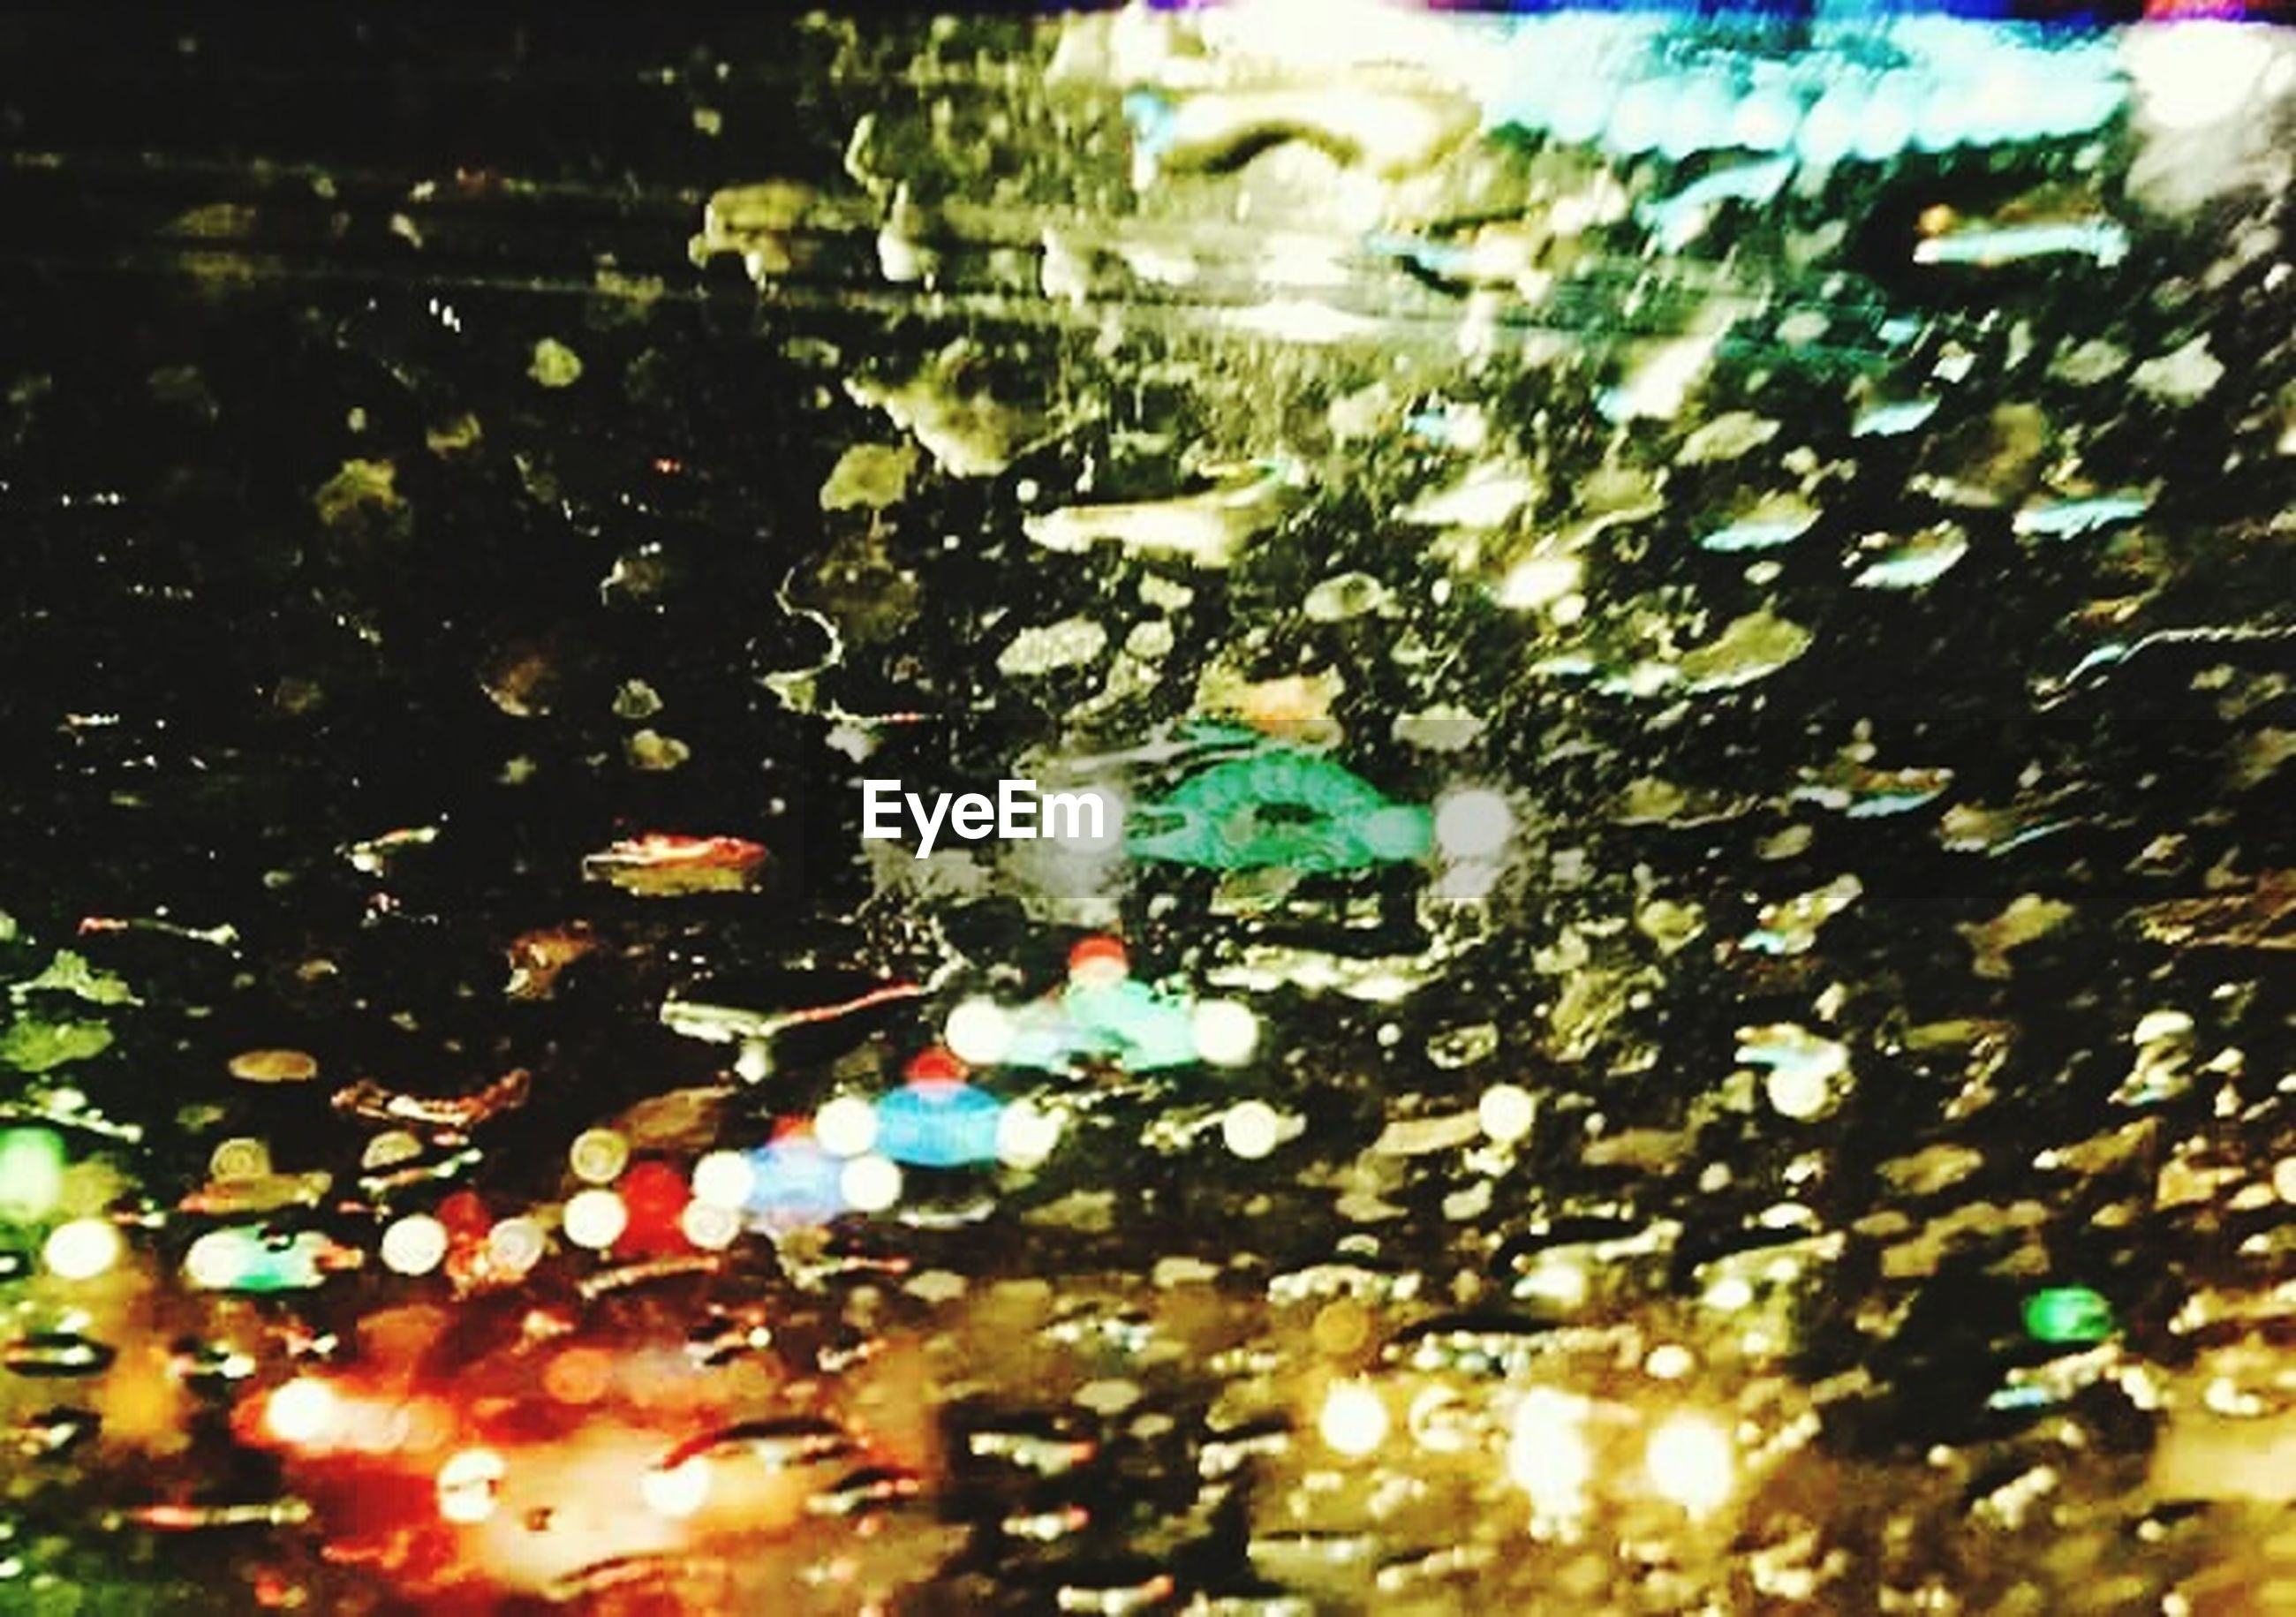 rain, wet, water, rainy season, car, full frame, drop, window, raindrop, backgrounds, weather, land vehicle, transportation, illuminated, road, day, looking through window, close-up, outdoors, no people, city, nature